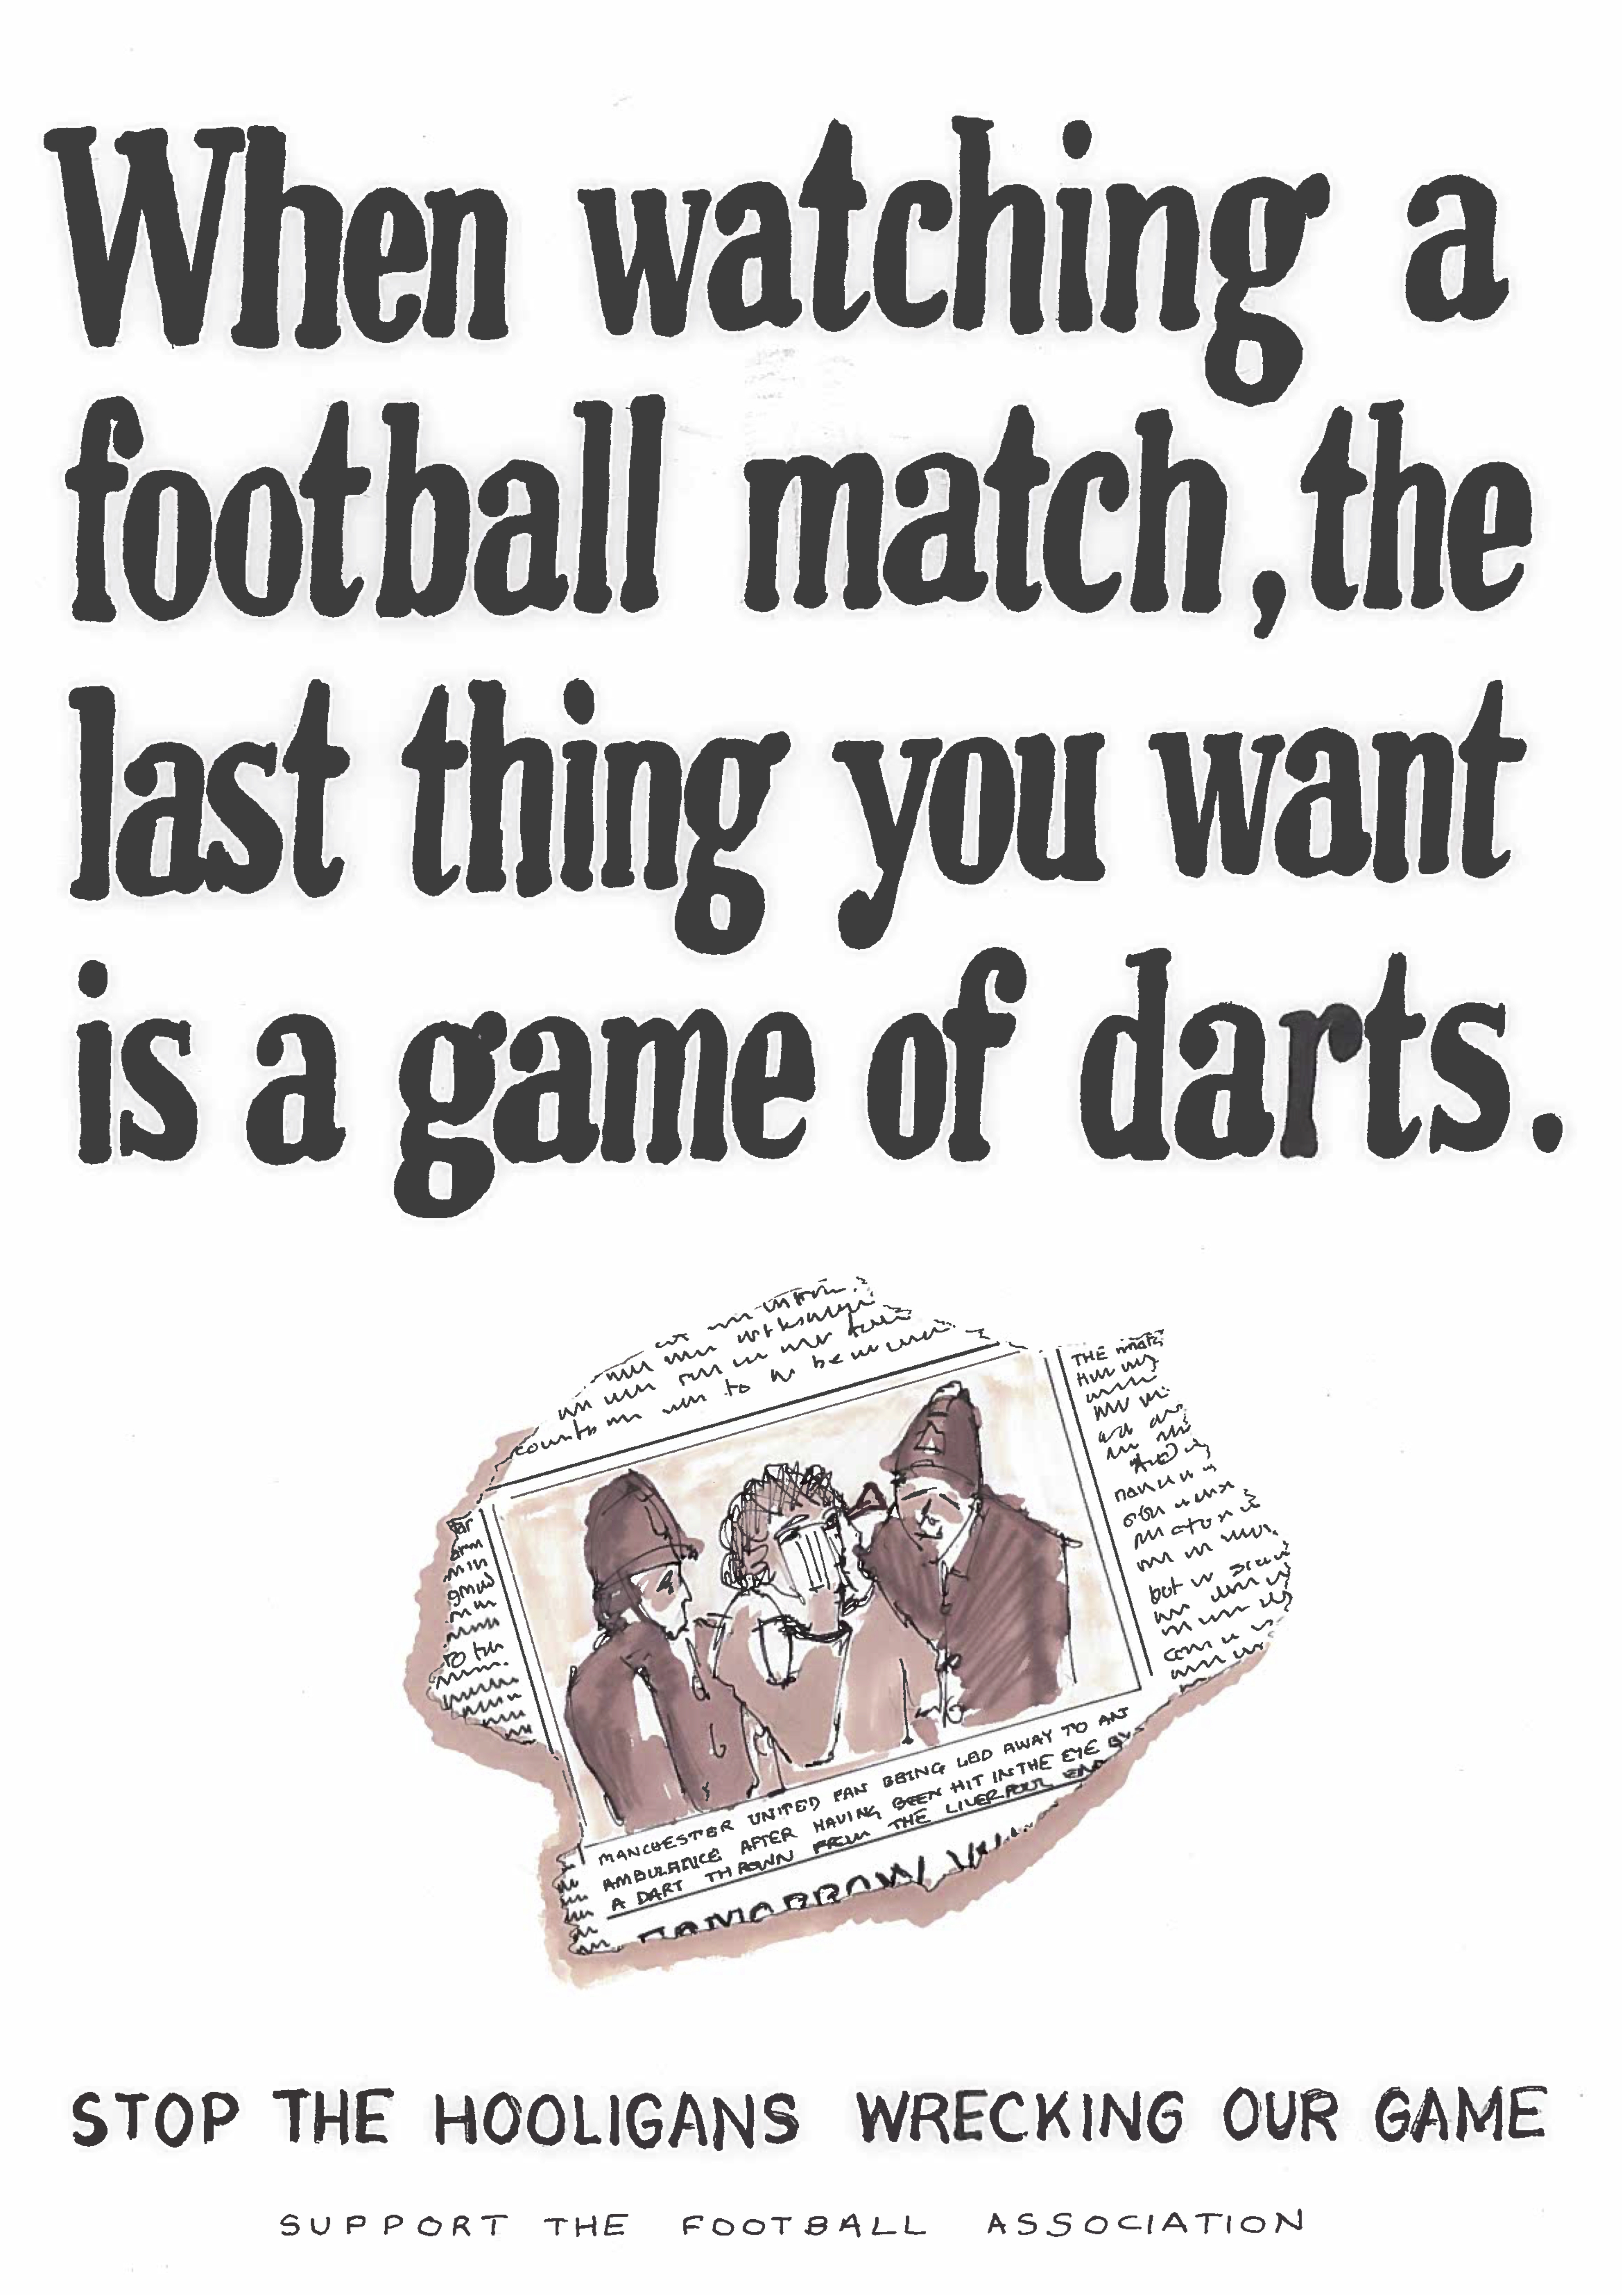 Tony Davidson . Football Association